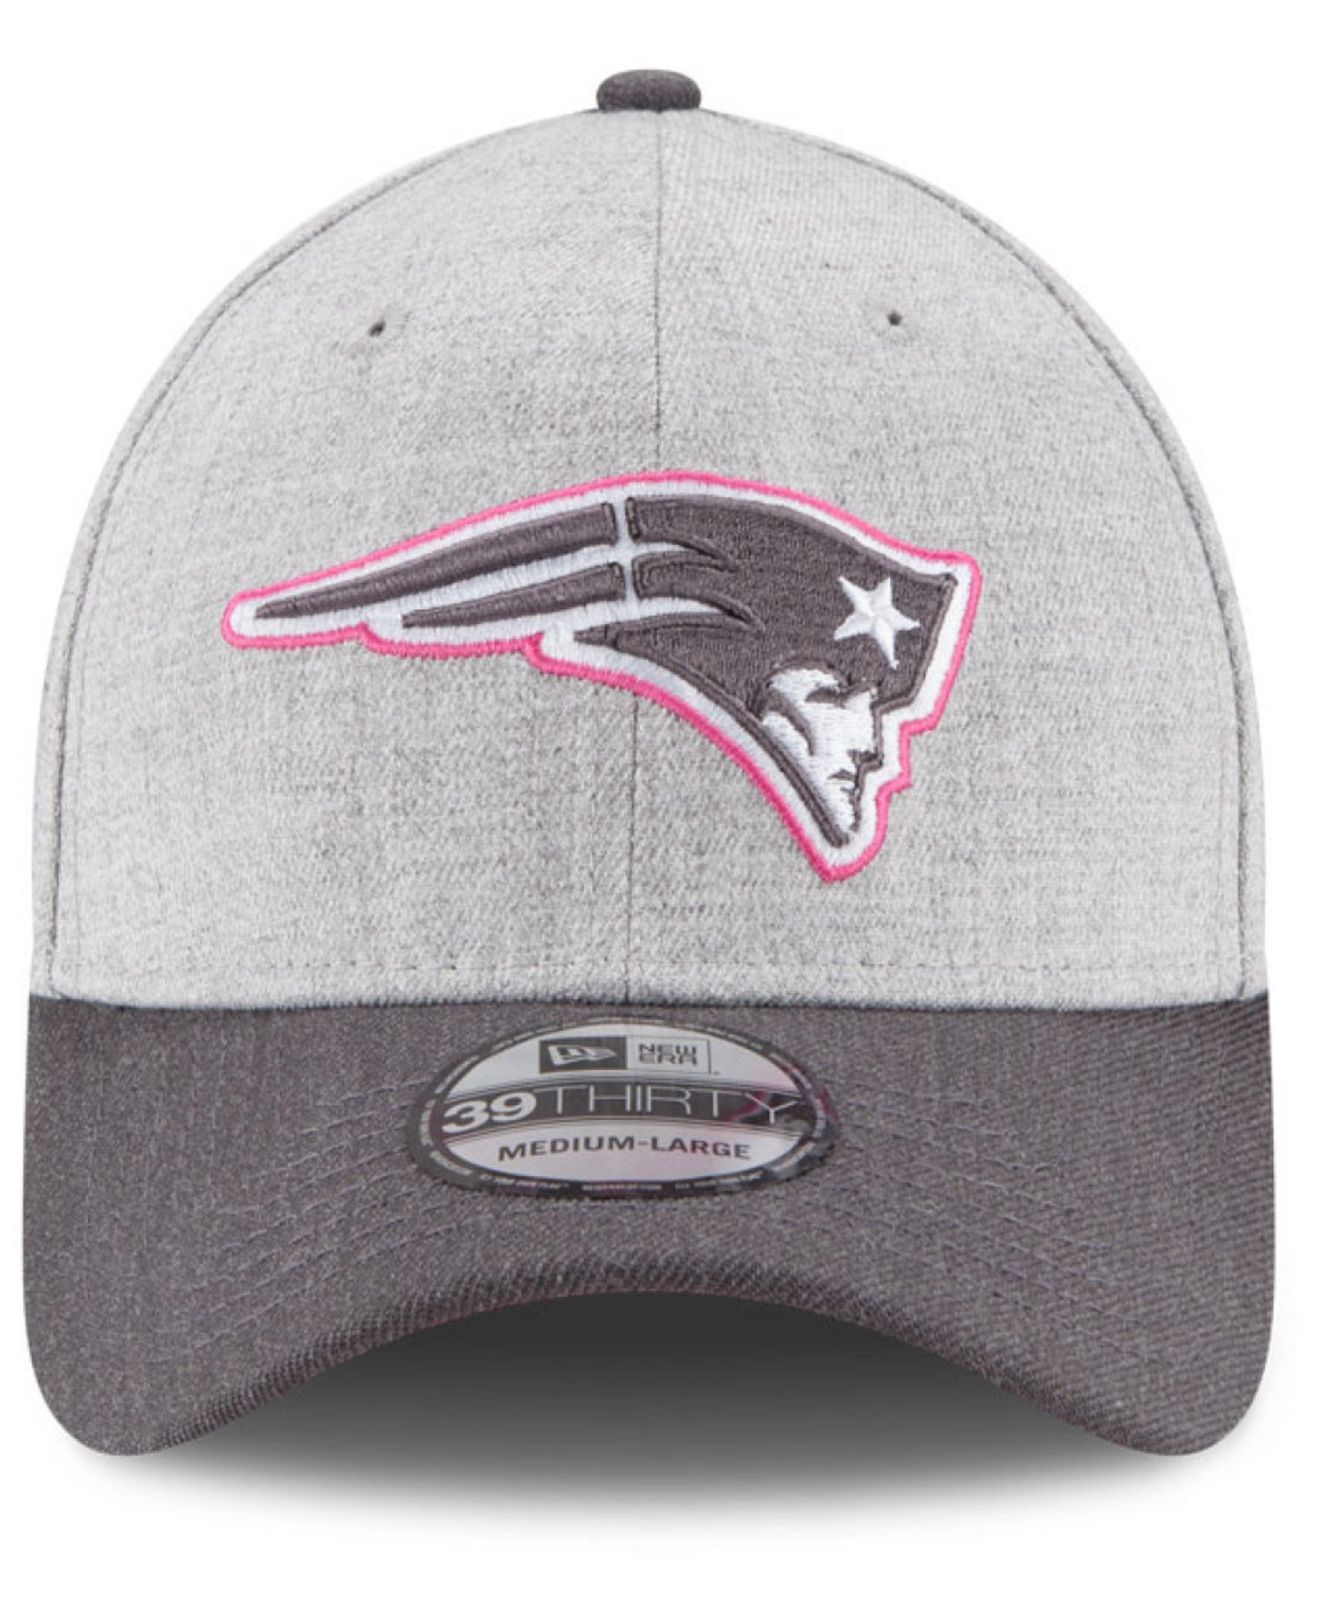 Lyst - KTZ New England Patriots Breast Cancer Awareness 39thirty Cap ... 5e106a5a5431